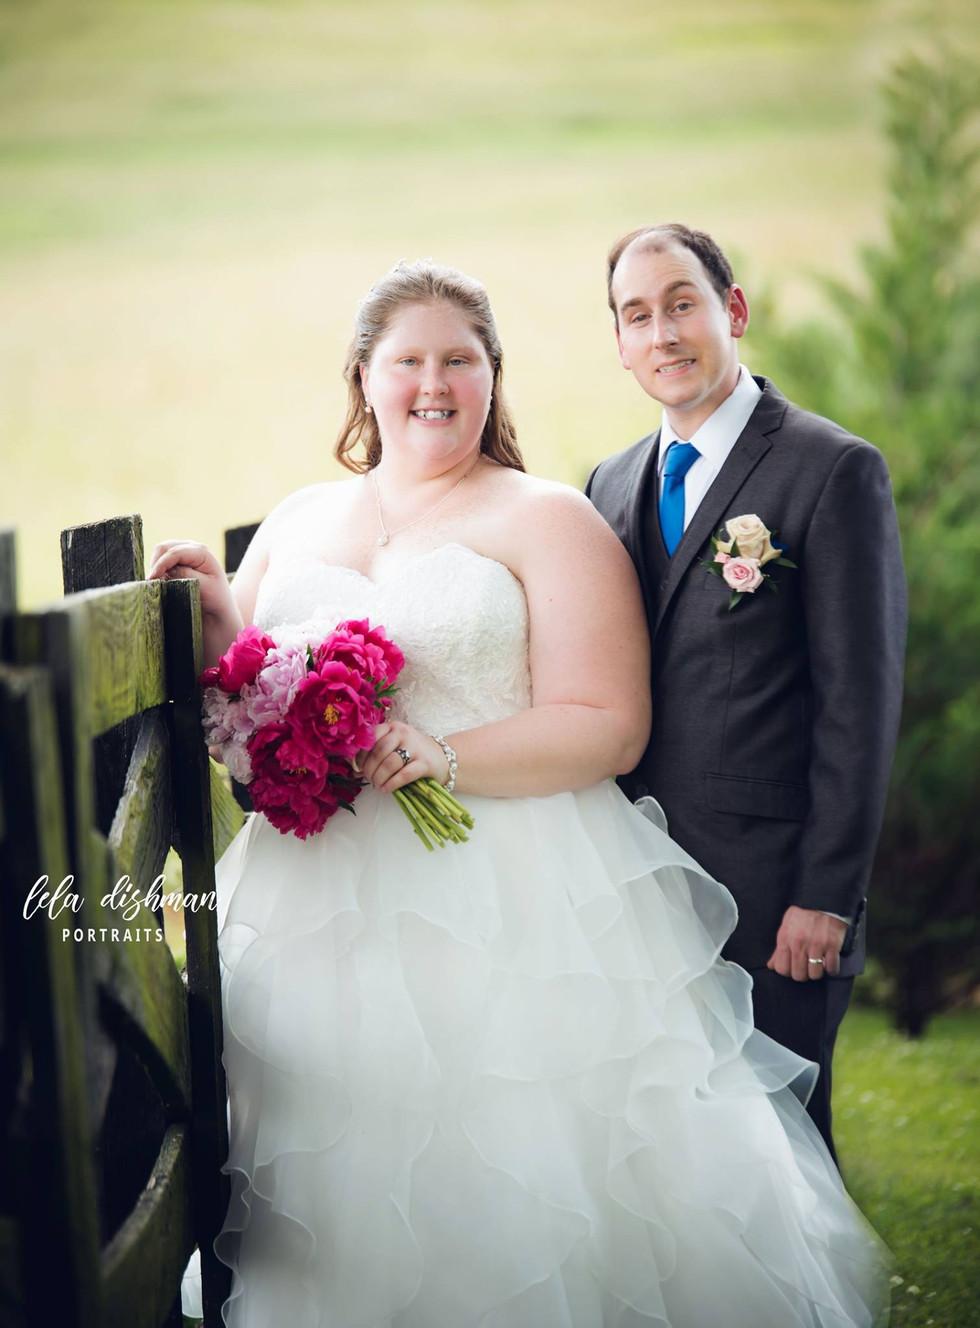 Wedding Photographer Tennessee- The Clark House Wedding-Congrats Fran and Eli